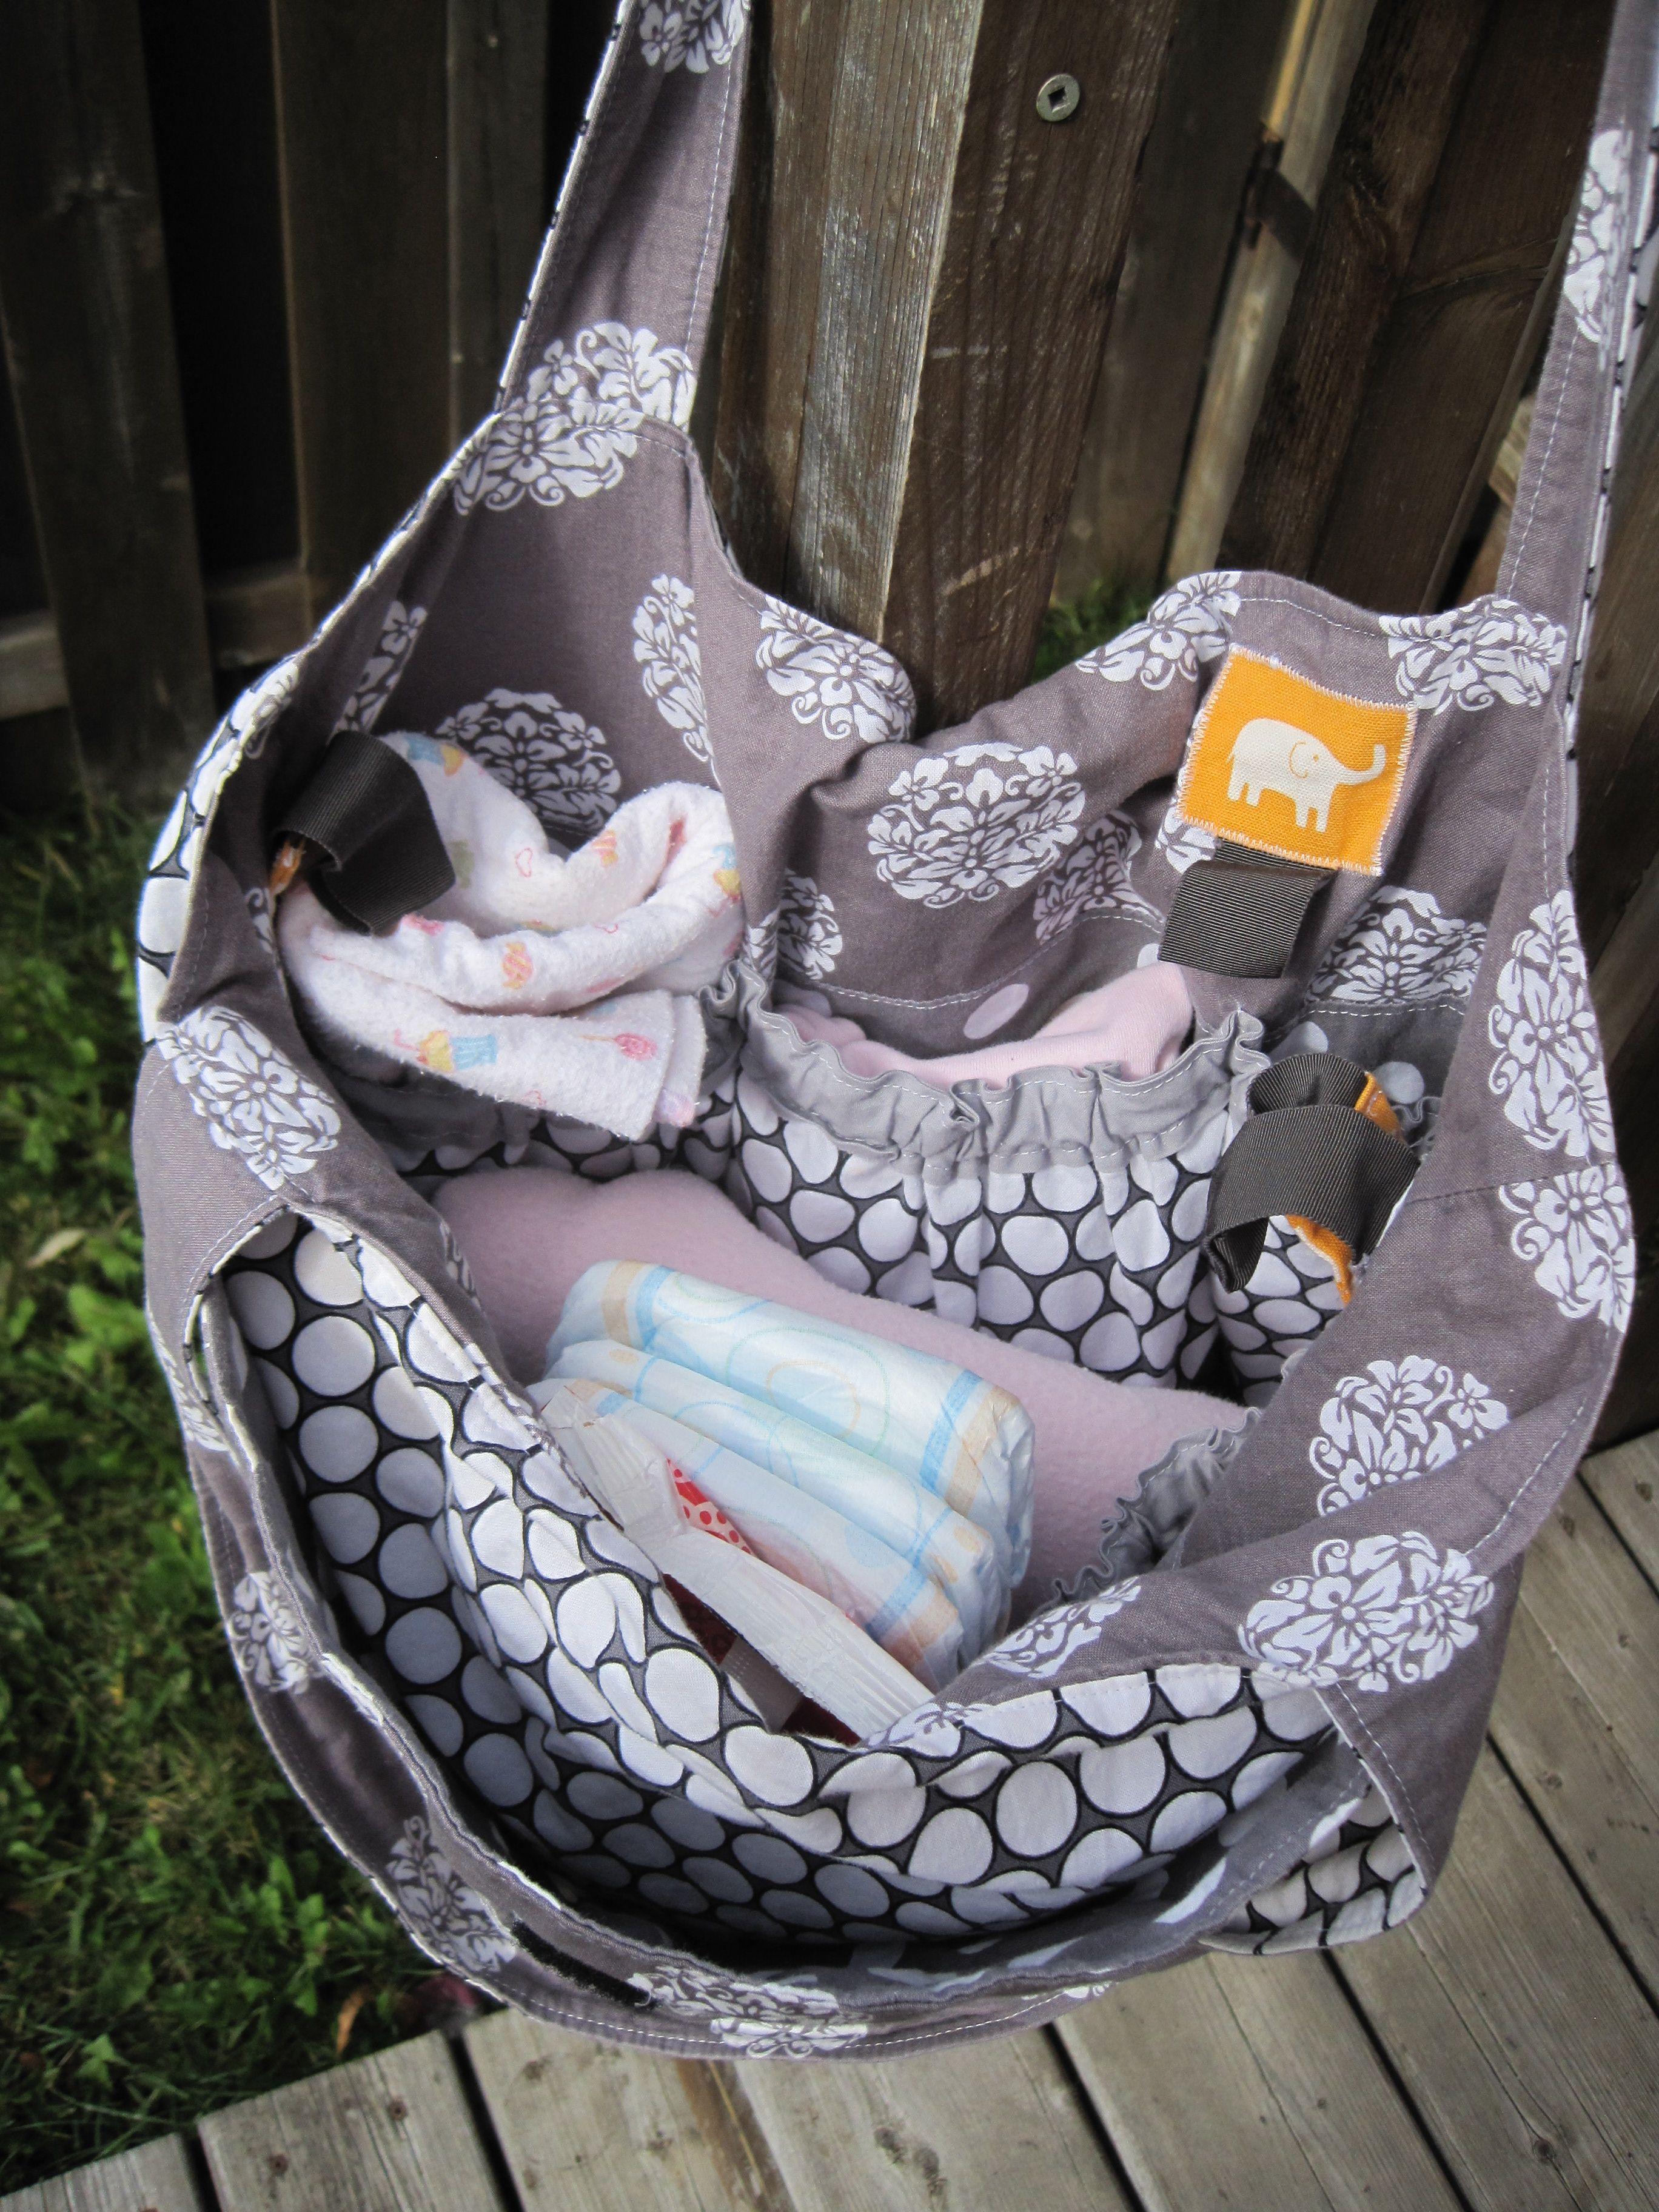 TBDBE - Inside   Sewing ~ Purses & Totes   Pinterest   Diaper bag ...